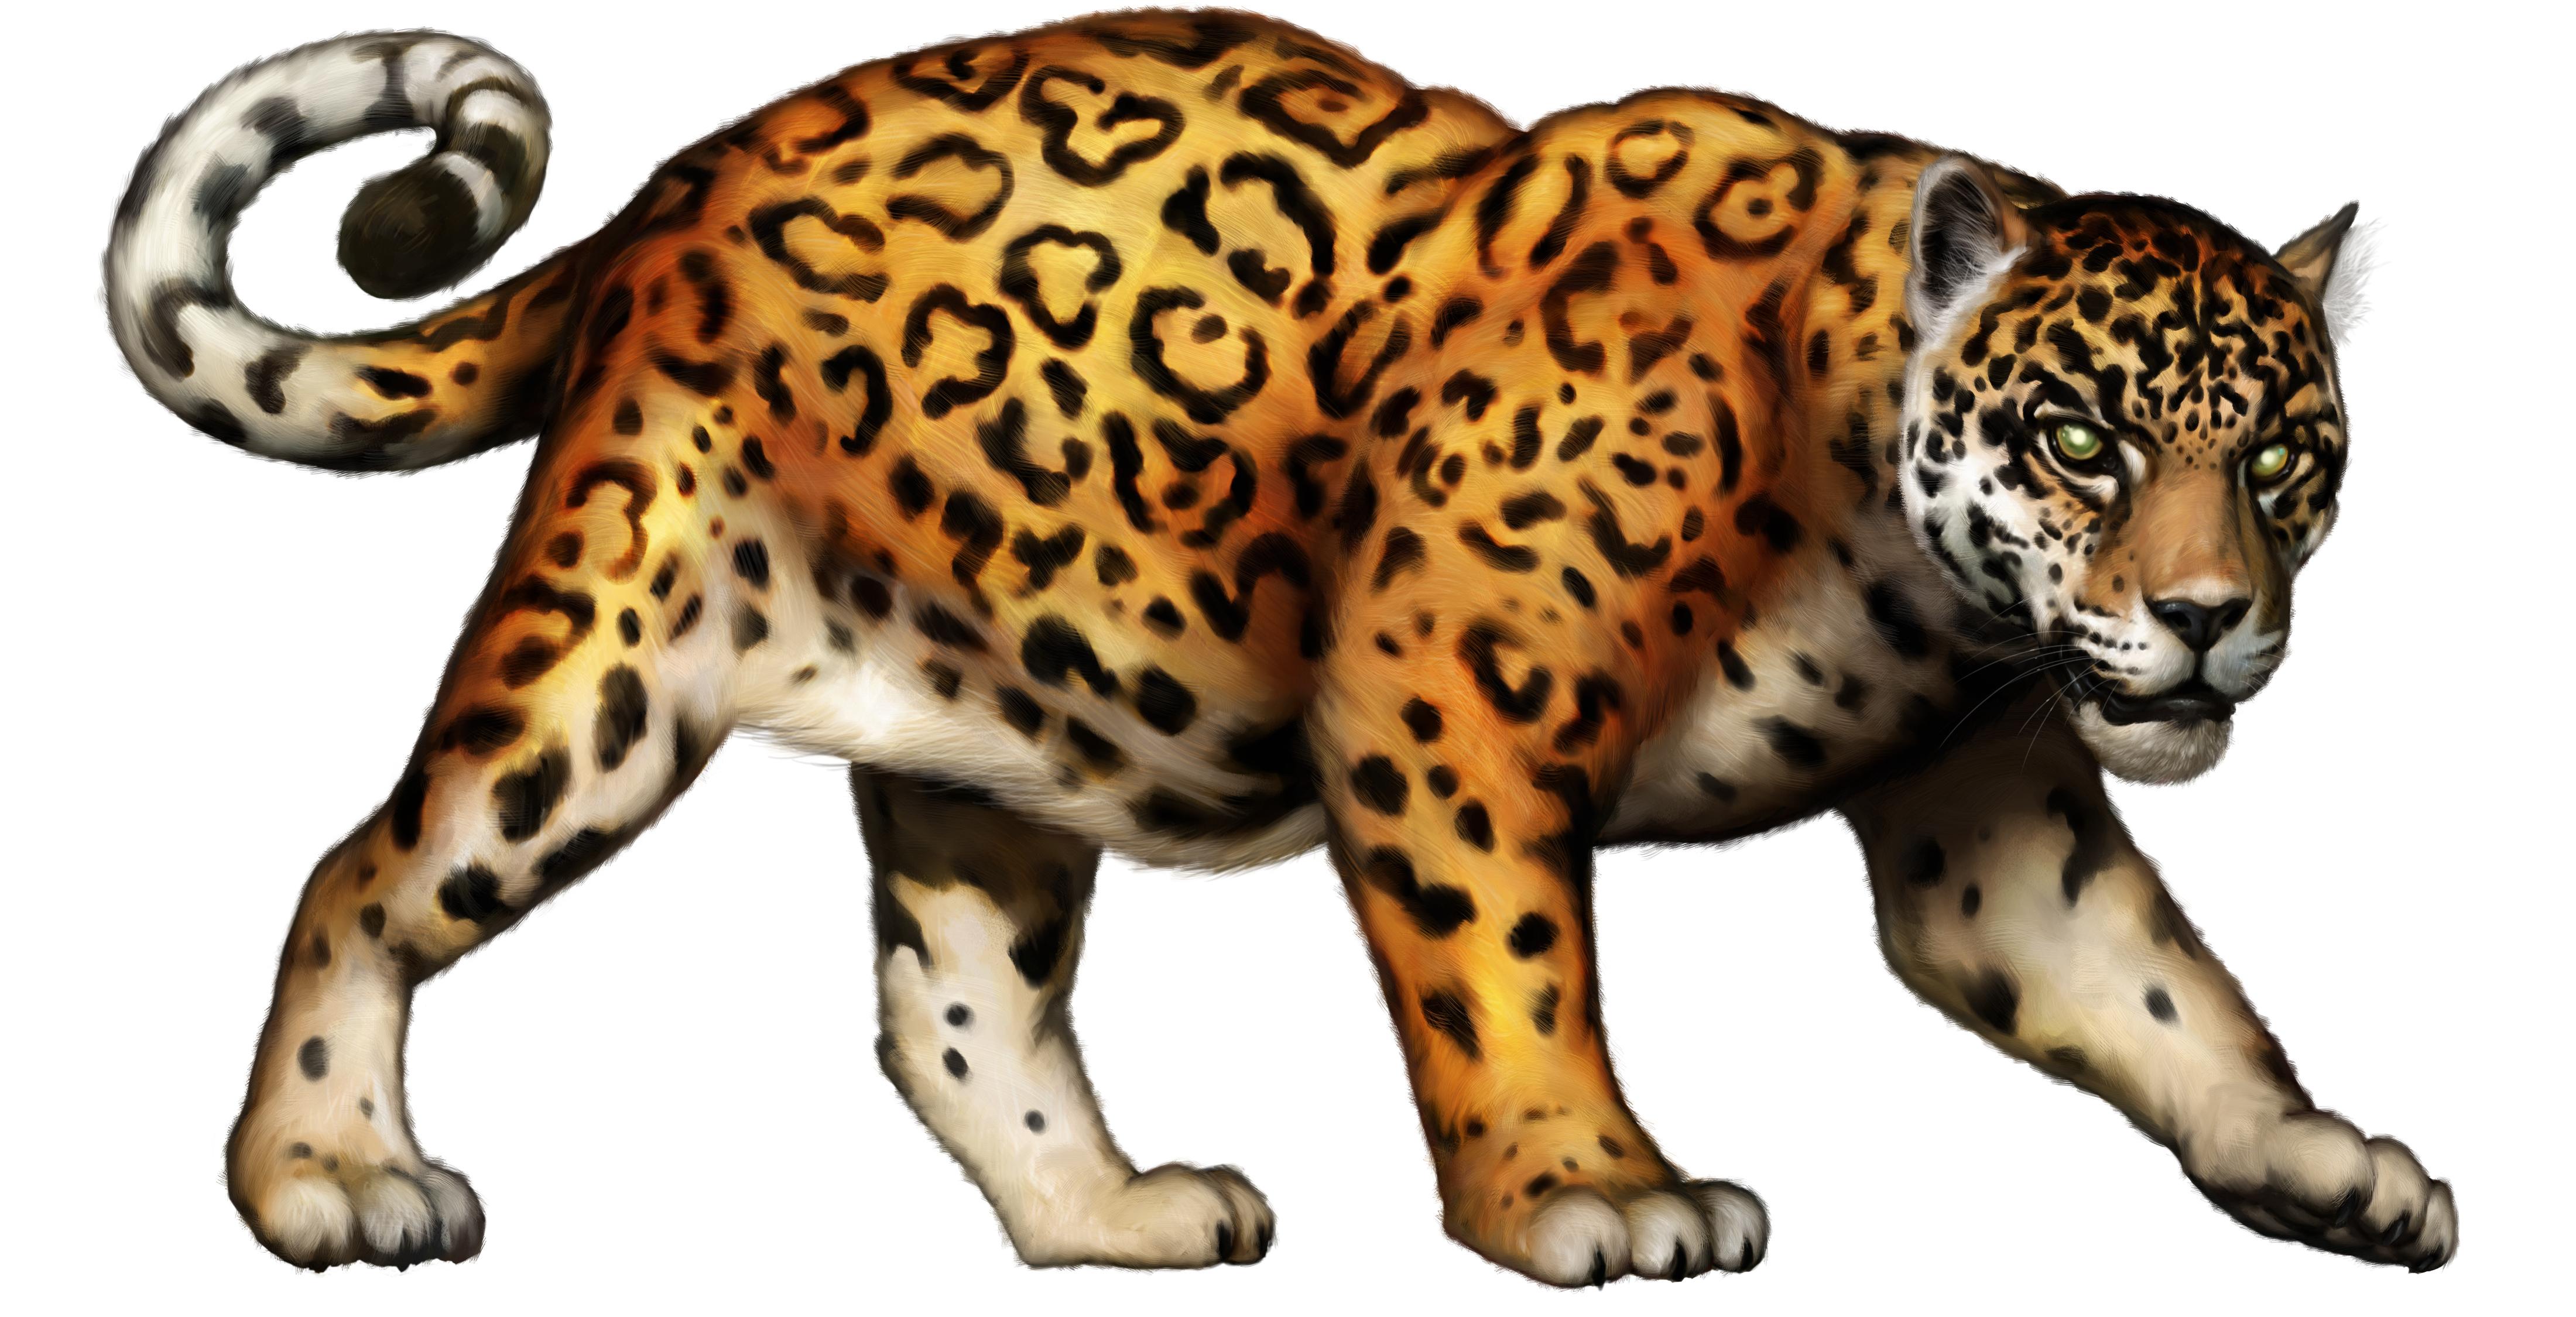 Jaguar clipart graphic royalty free Free Jaguar Cliparts, Download Free Clip Art, Free Clip Art ... graphic royalty free